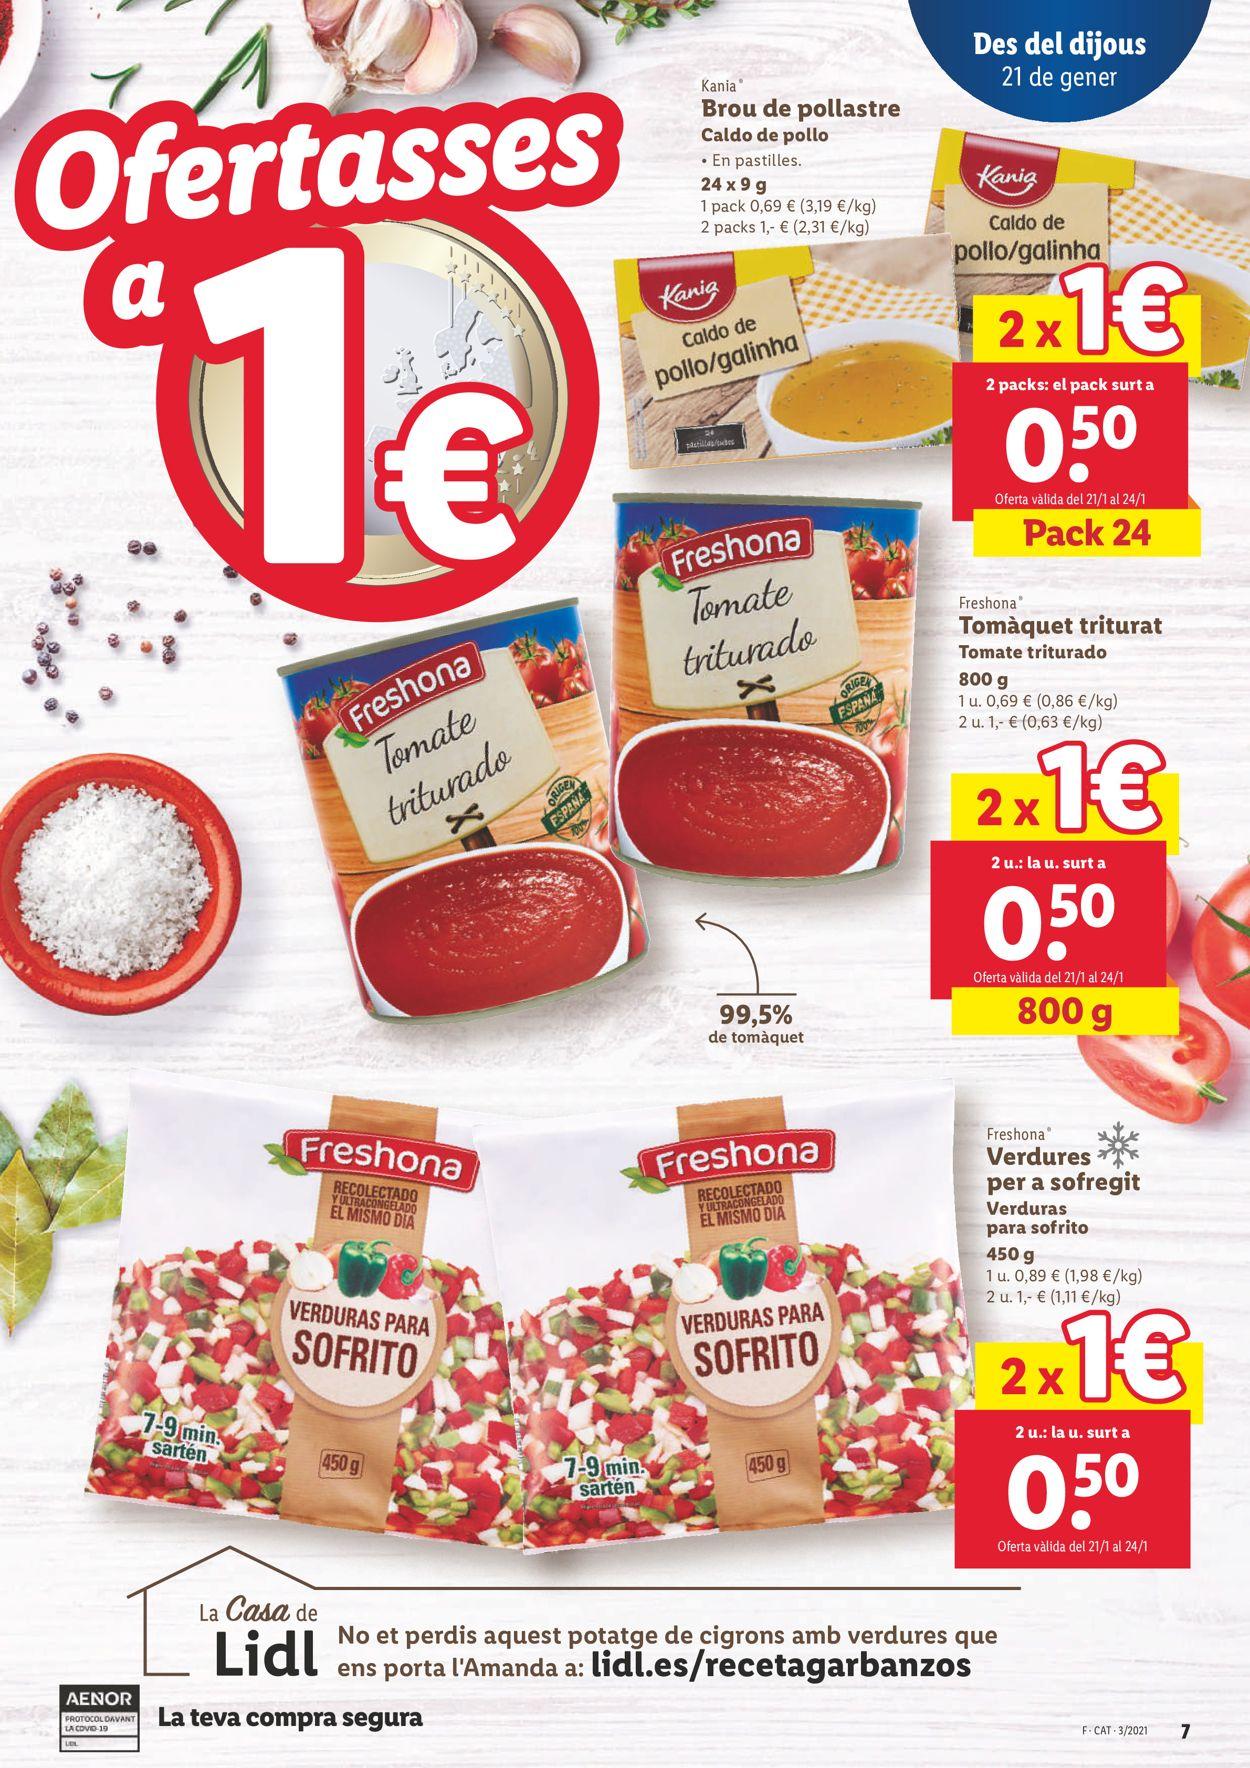 Lidl Ofertasses a 1€ Folleto - 21.01-27.01.2021 (Página 7)